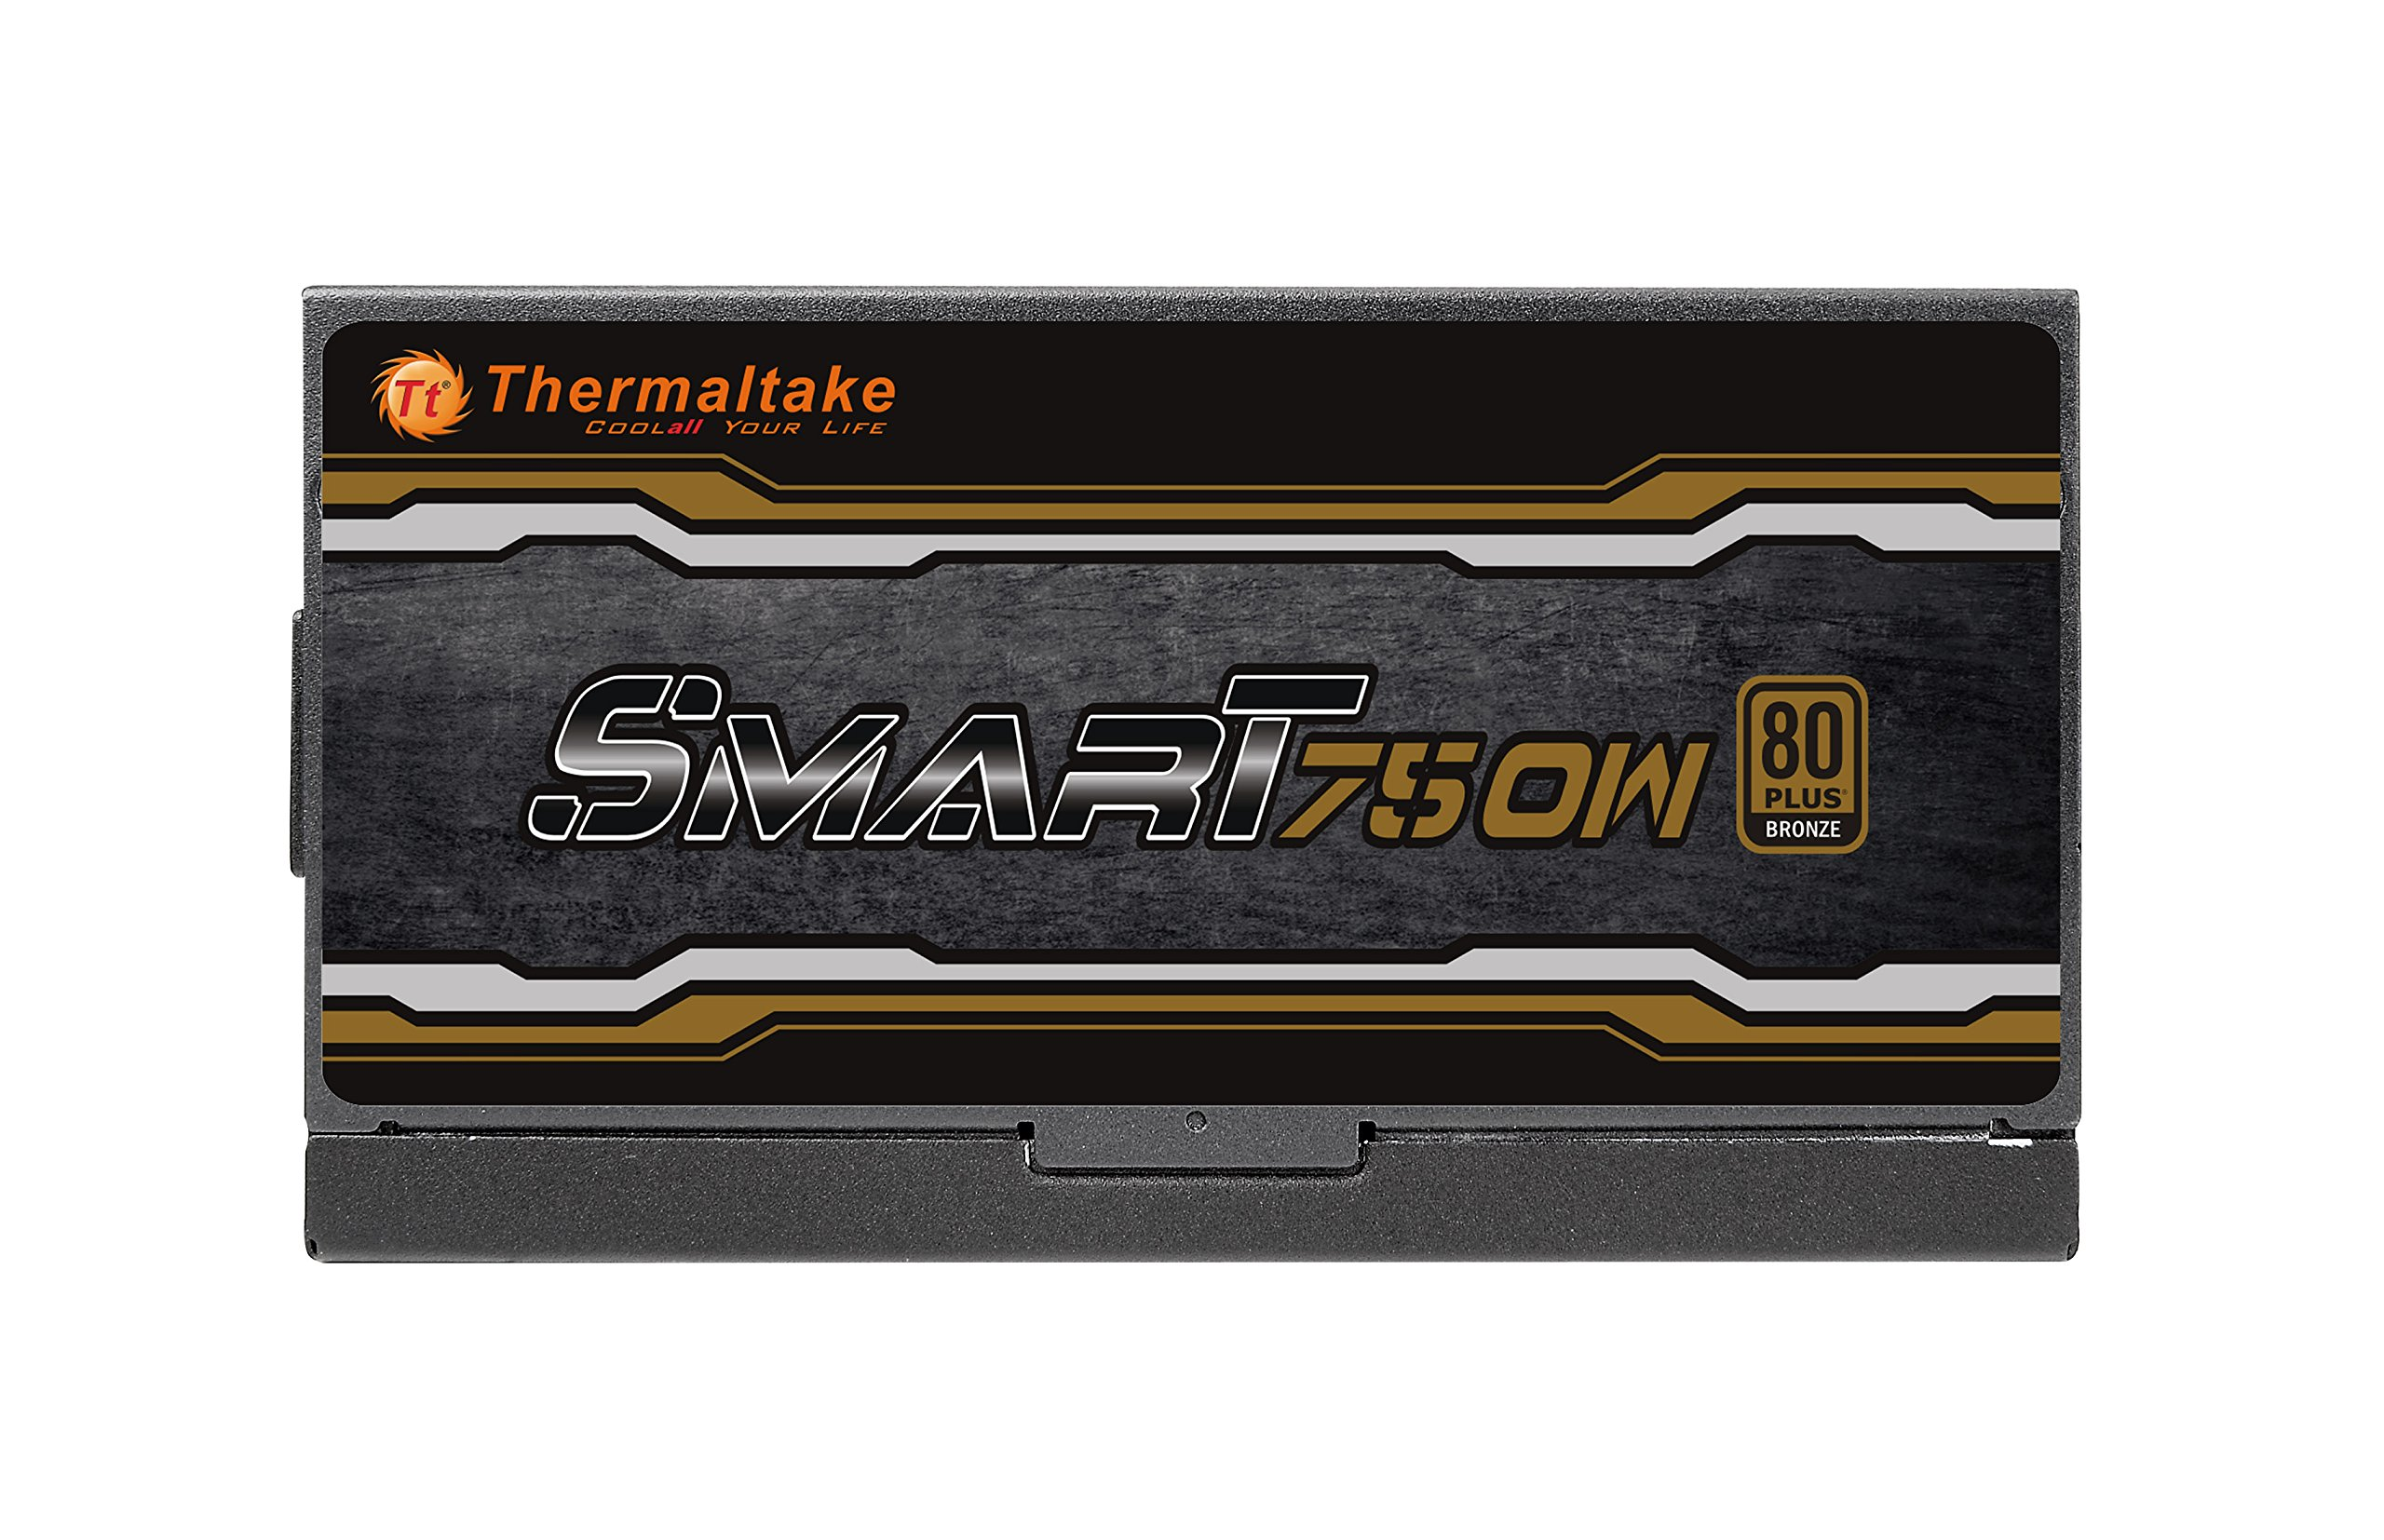 Thermaltake Smart Standard 750W 80 PLUS Bronze ATX12V 2.3 Power Supply SP-750P by Thermaltake (Image #2)